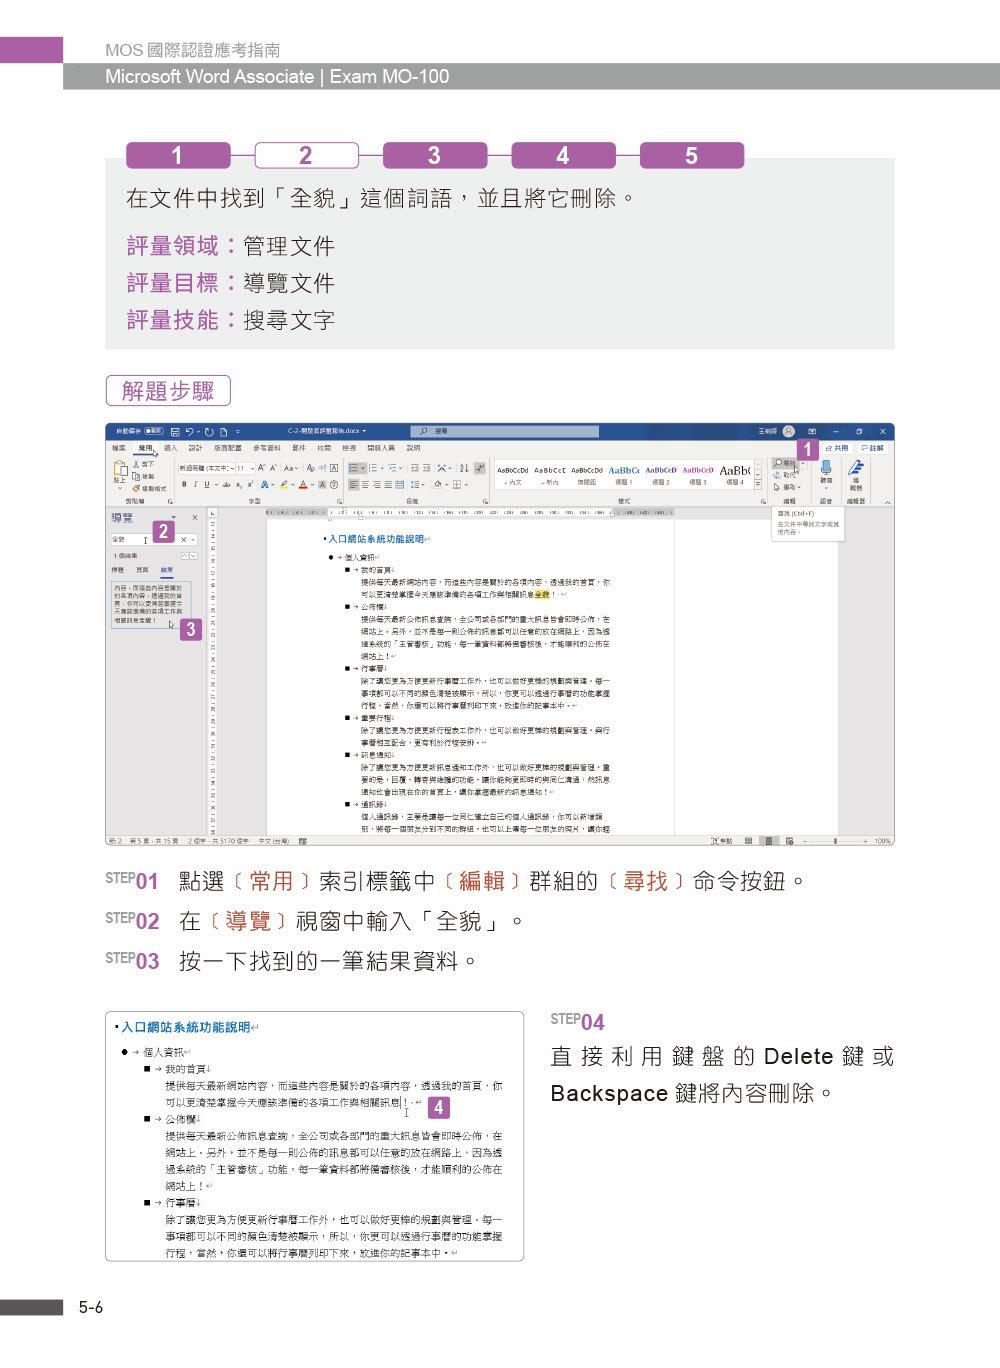 MOS 國際認證應考指南 -- Microsoft Word Associate|Exam MO-100-preview-8